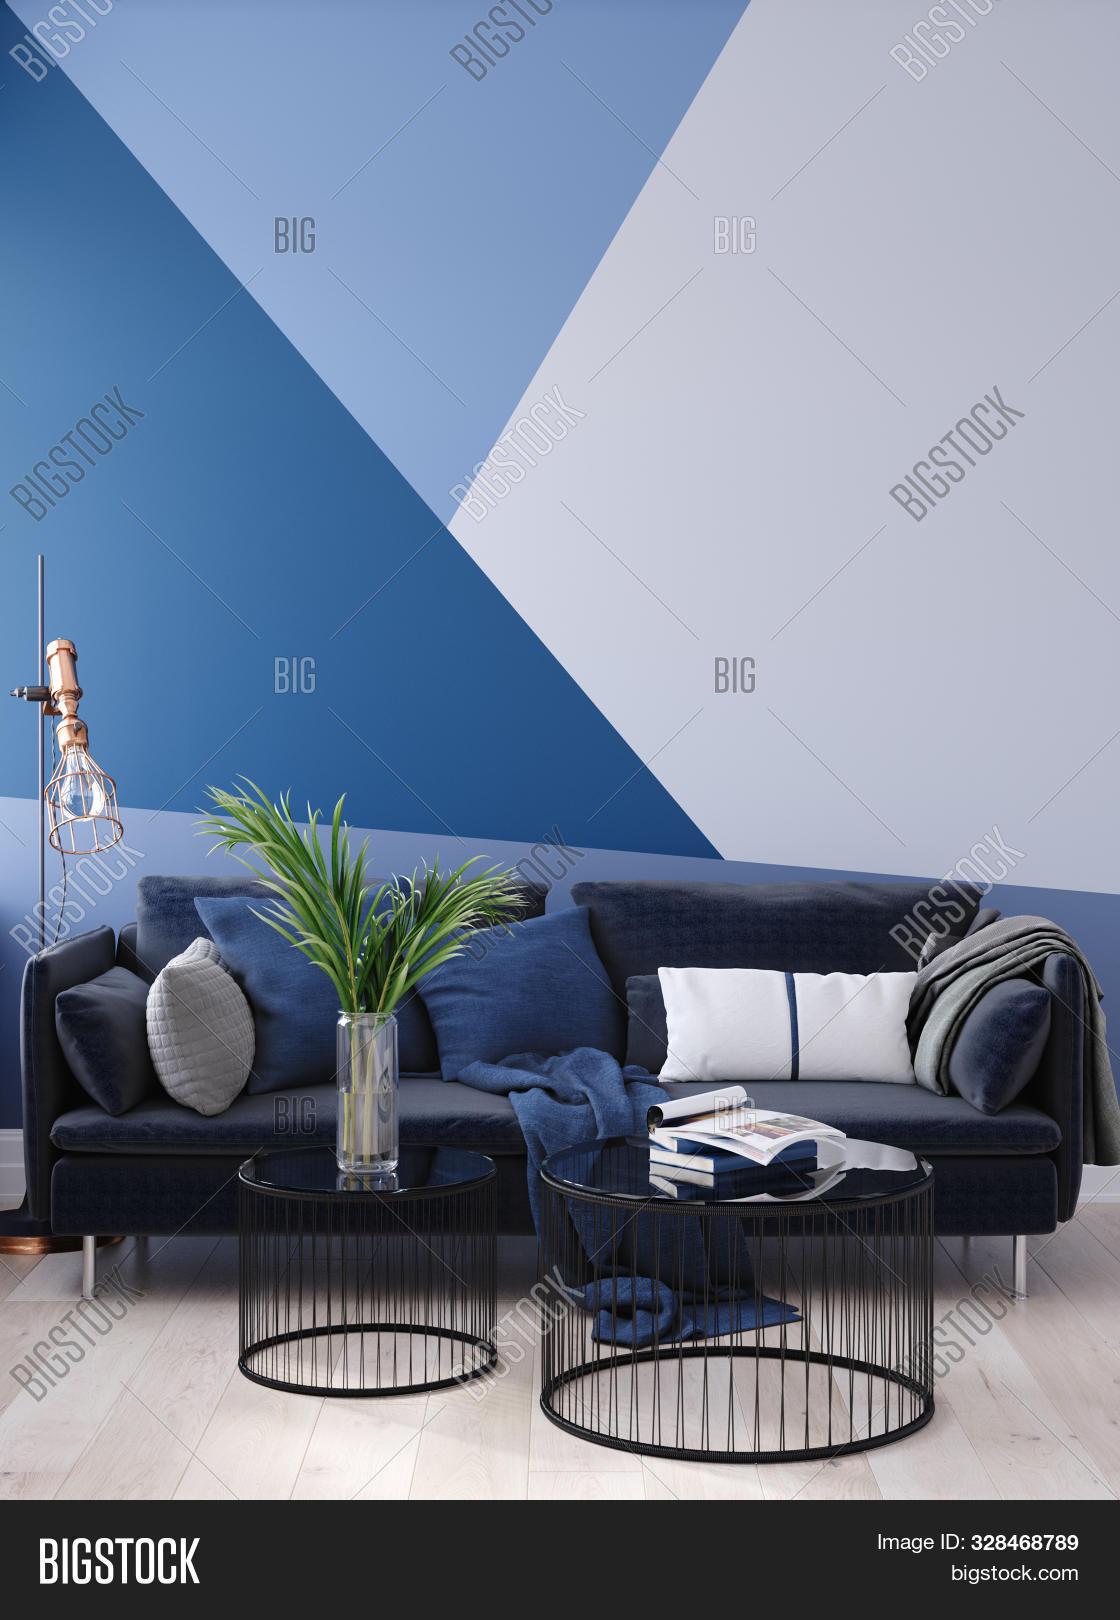 Luxury Modern Blue Image Photo Free Trial Bigstock